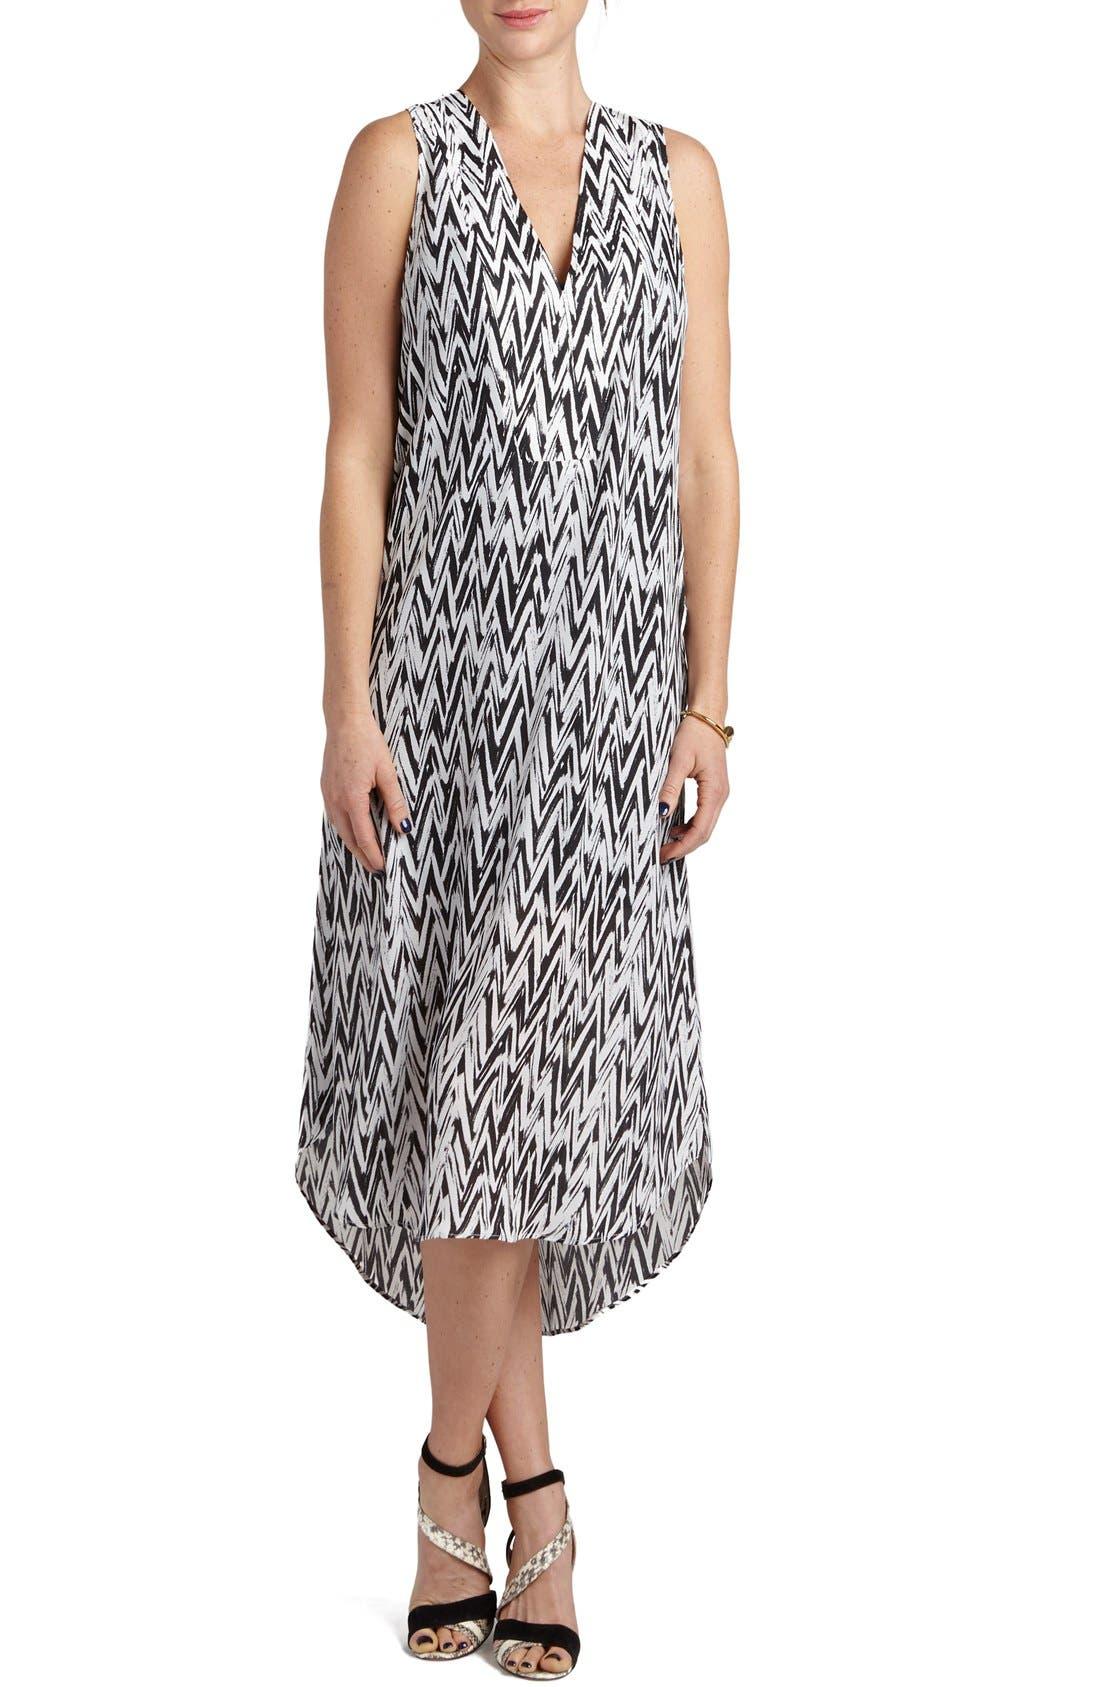 'January' Print Maternity/Nursing High/Low Dress,                         Main,                         color, Black/ White Chevron